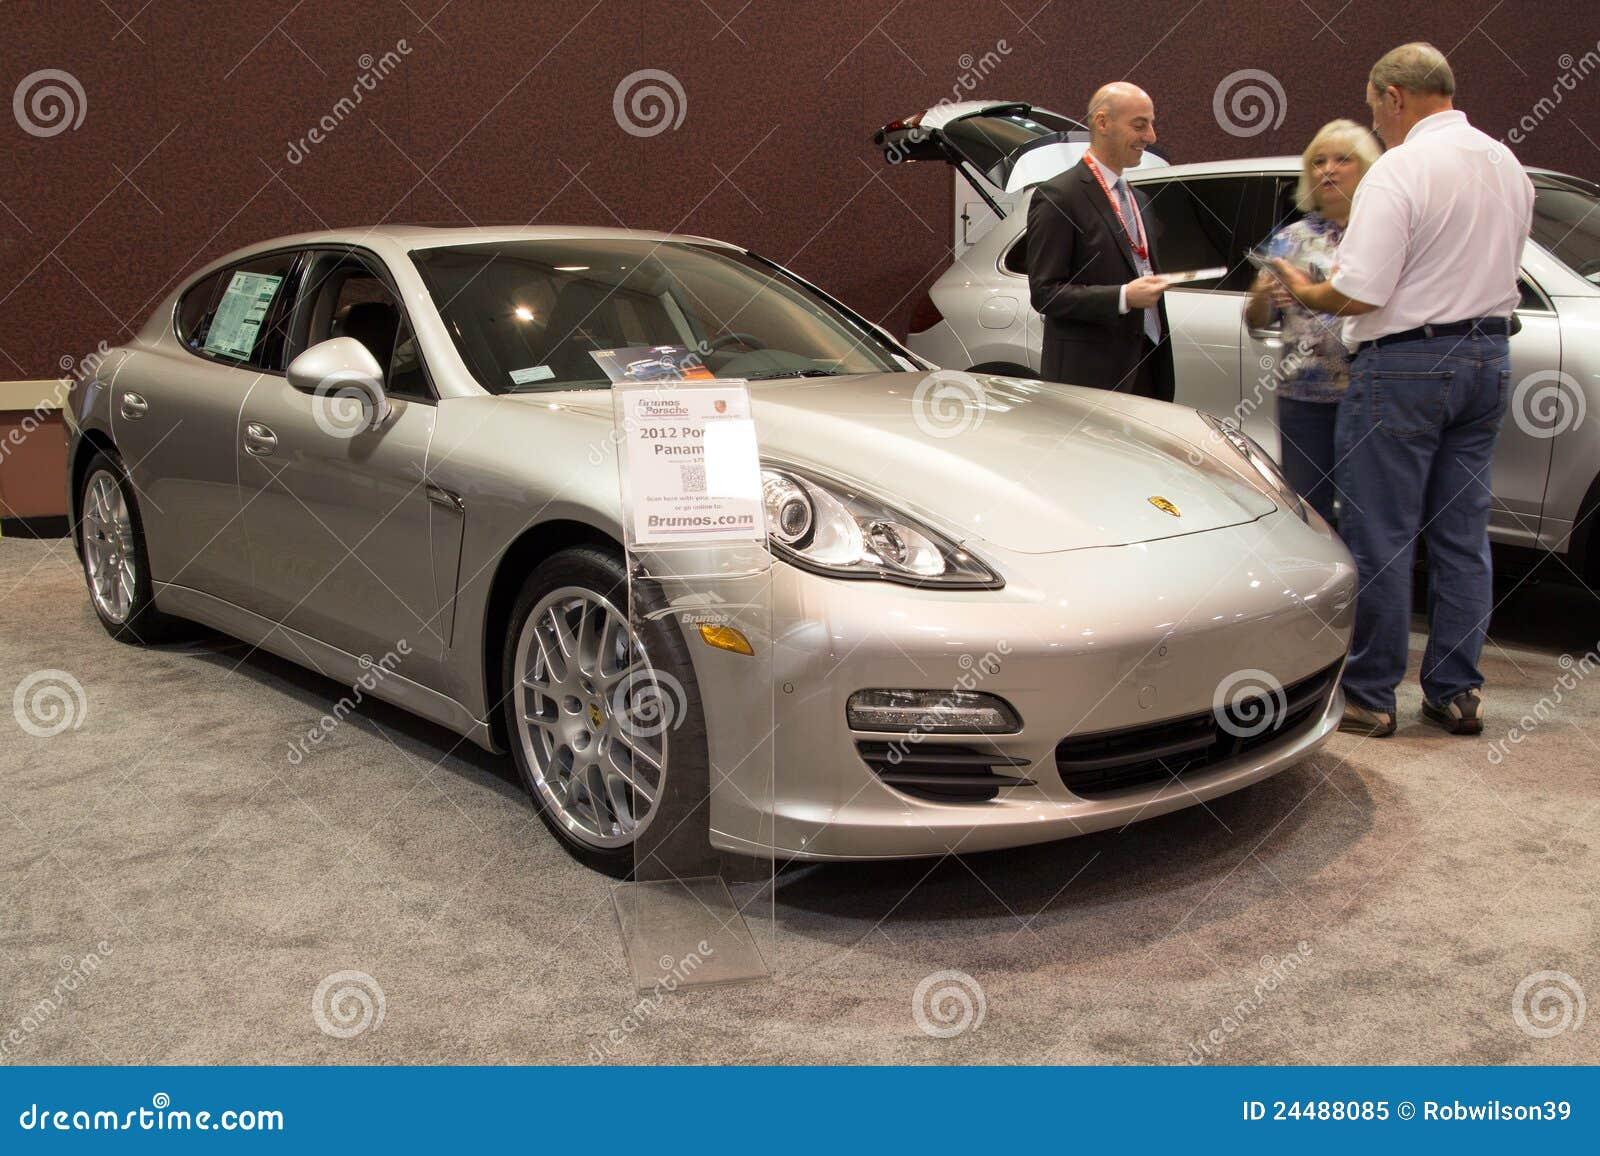 Porsche Panamera Editorial Image Image Of Front - Jacksonville car show